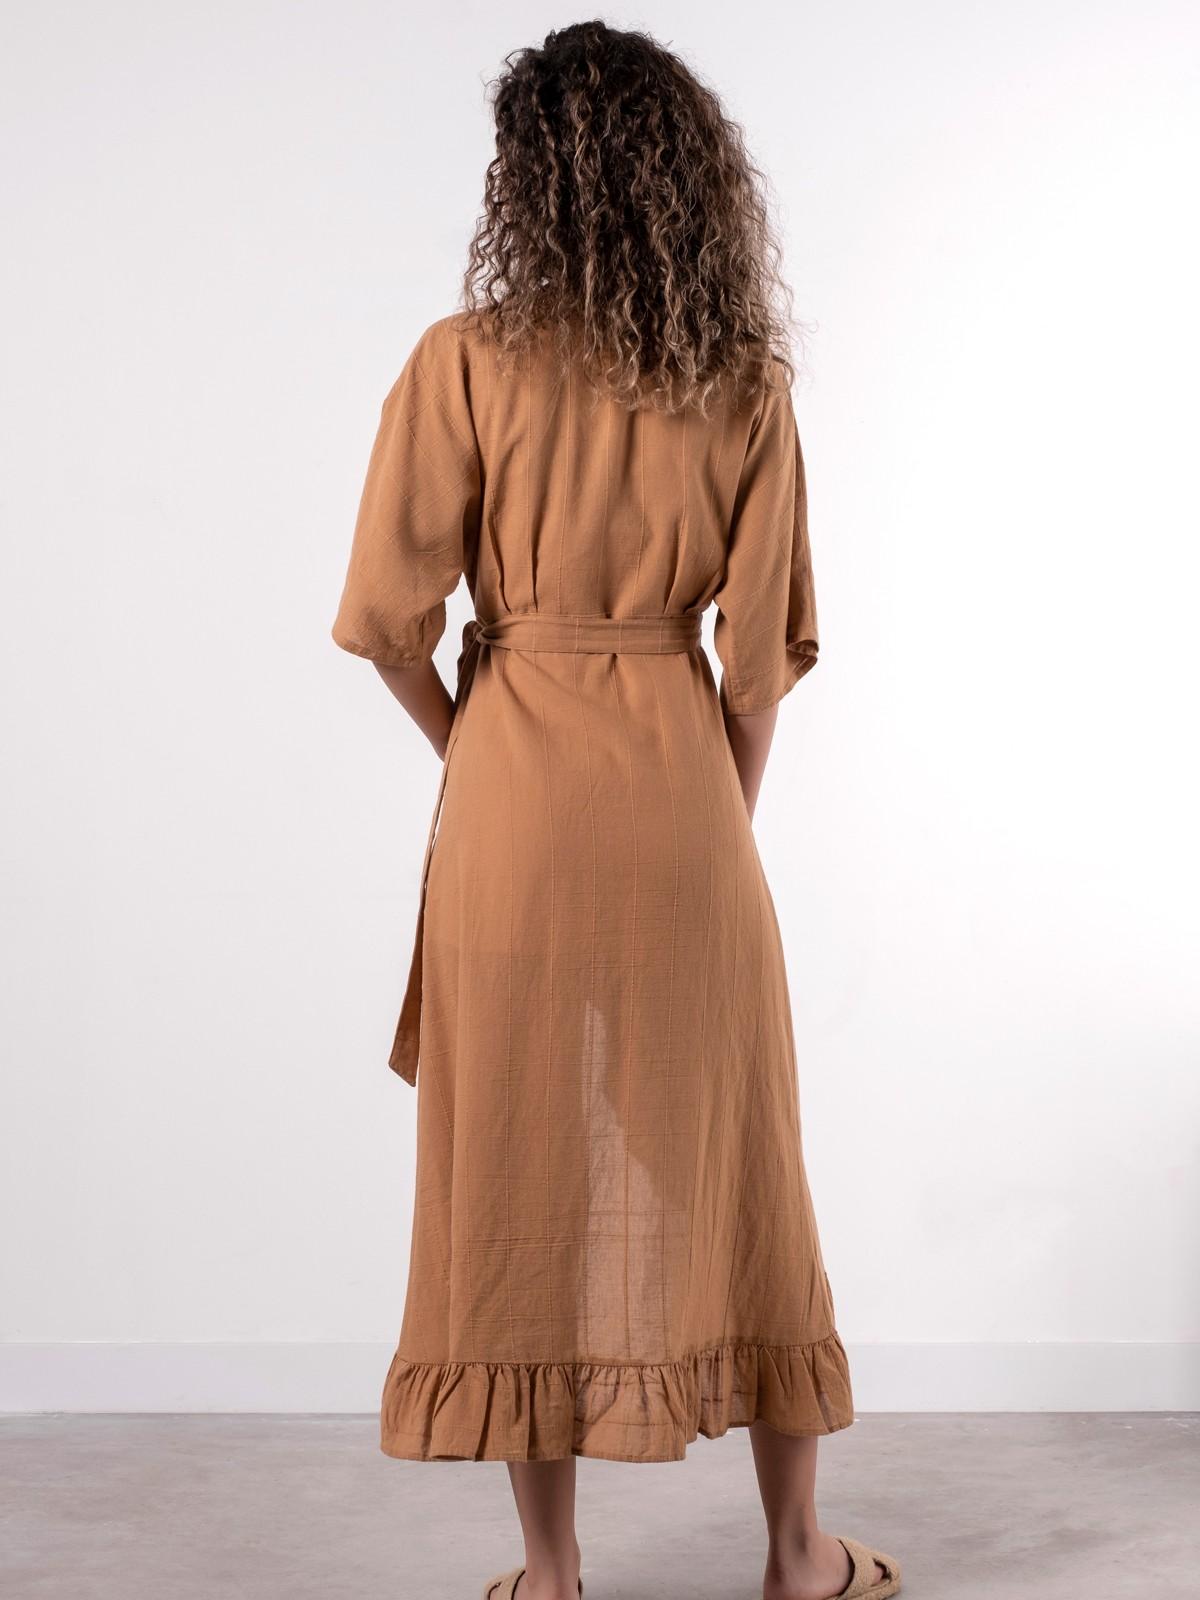 frilled-dress-indiantan5-1200x1600w